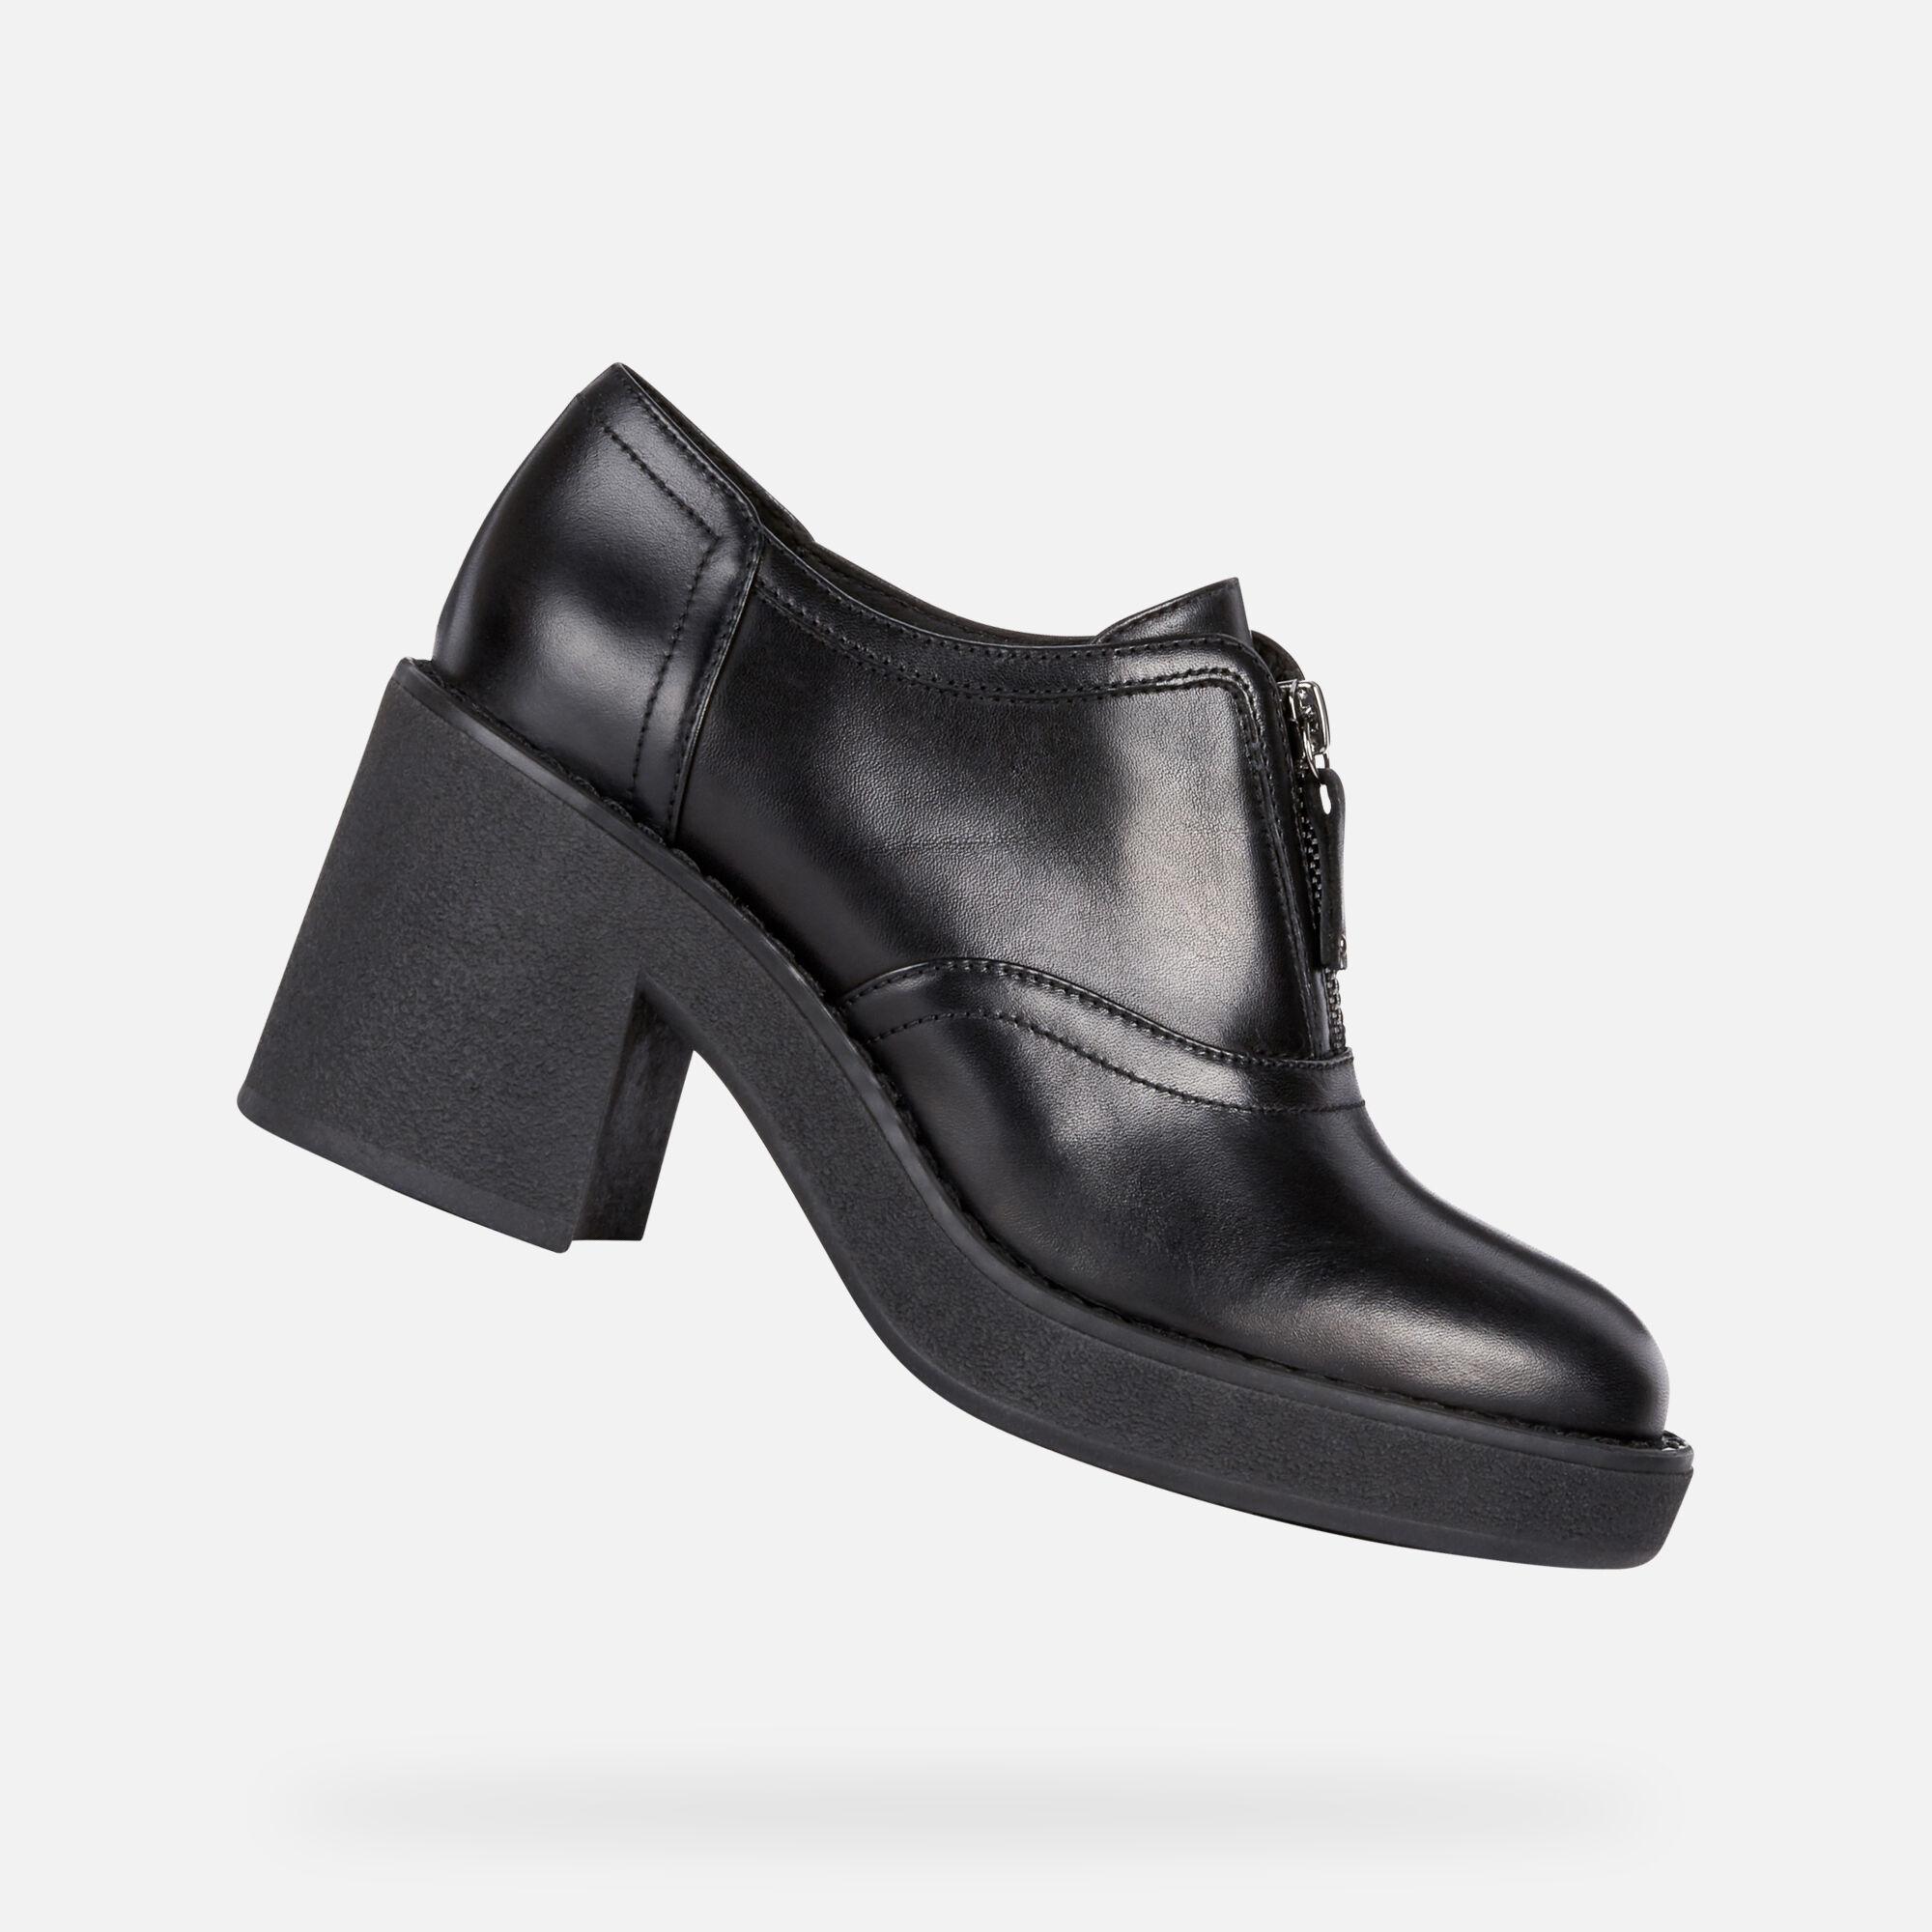 Geox ADRYA MID Femme Chaussures Noires | Geox Boutique en ligne